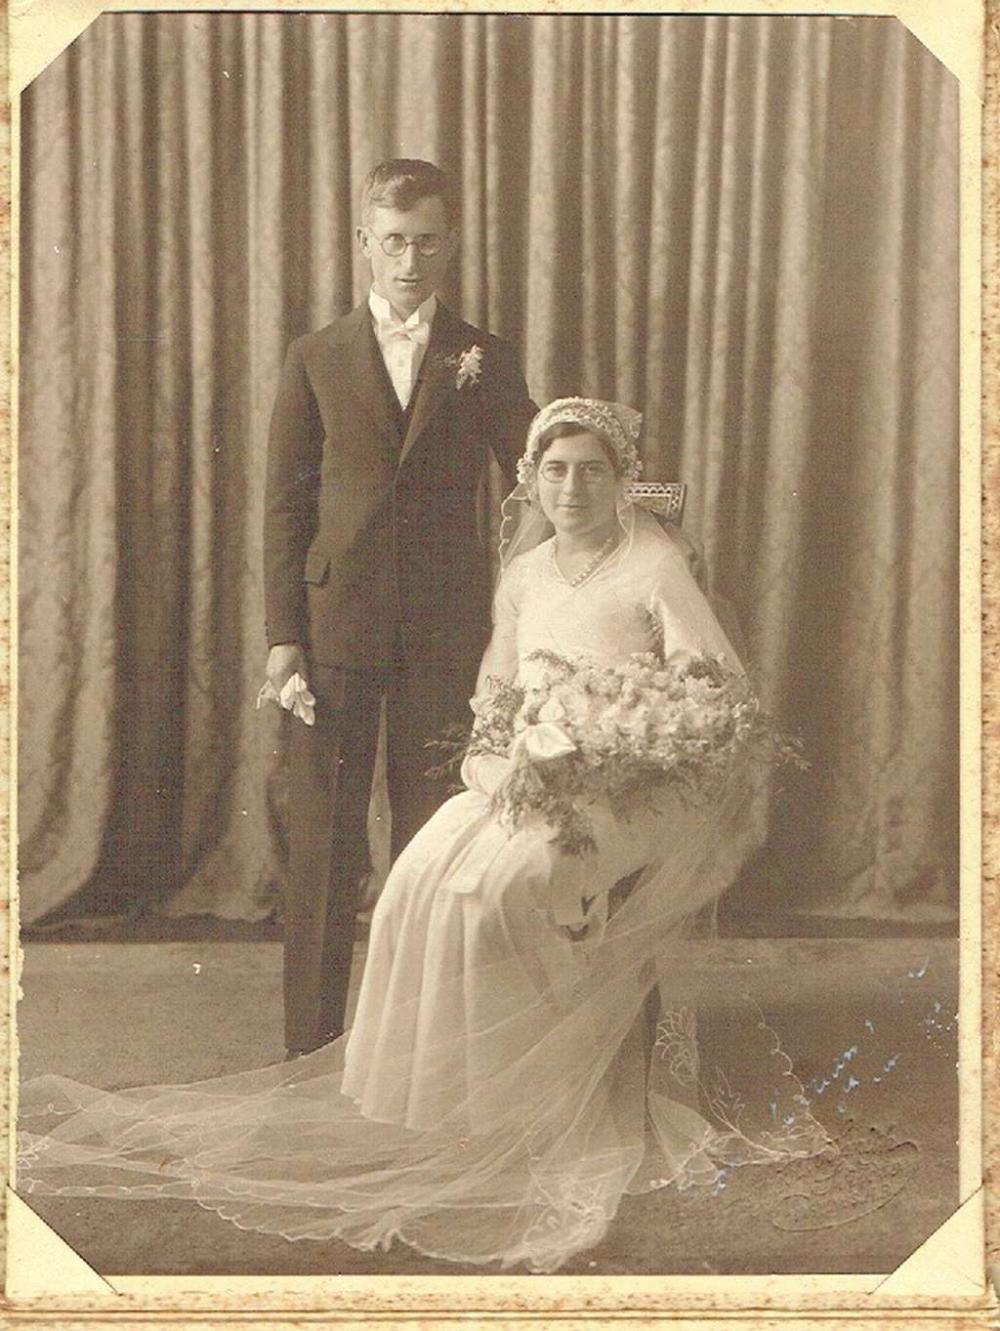 Antique wedding photo of a Jewish couple in orig. folder.